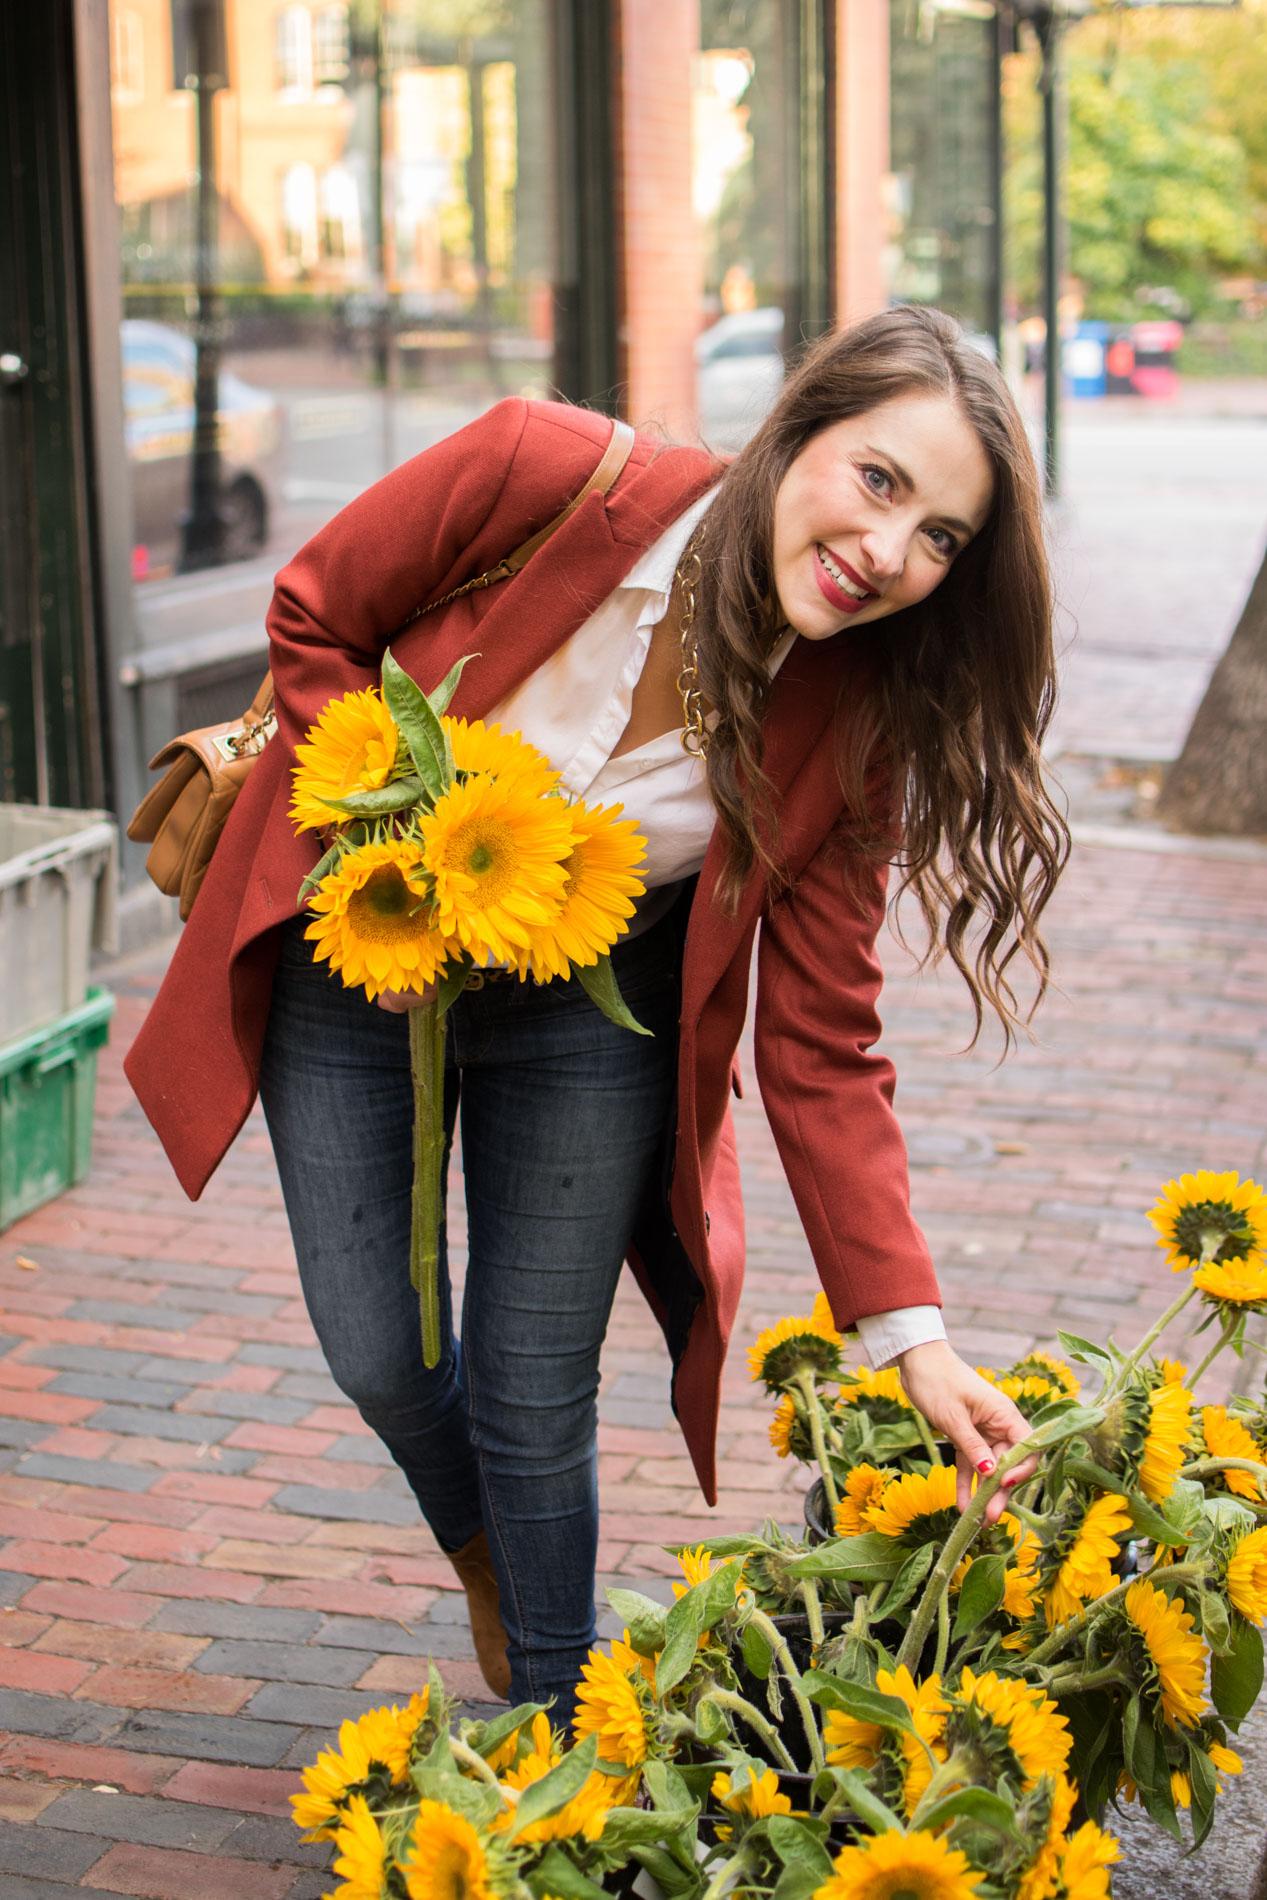 stylish fall coats, sunflowers, siena farms boston, j.crew parke topcoat, boston, the-alyst.com